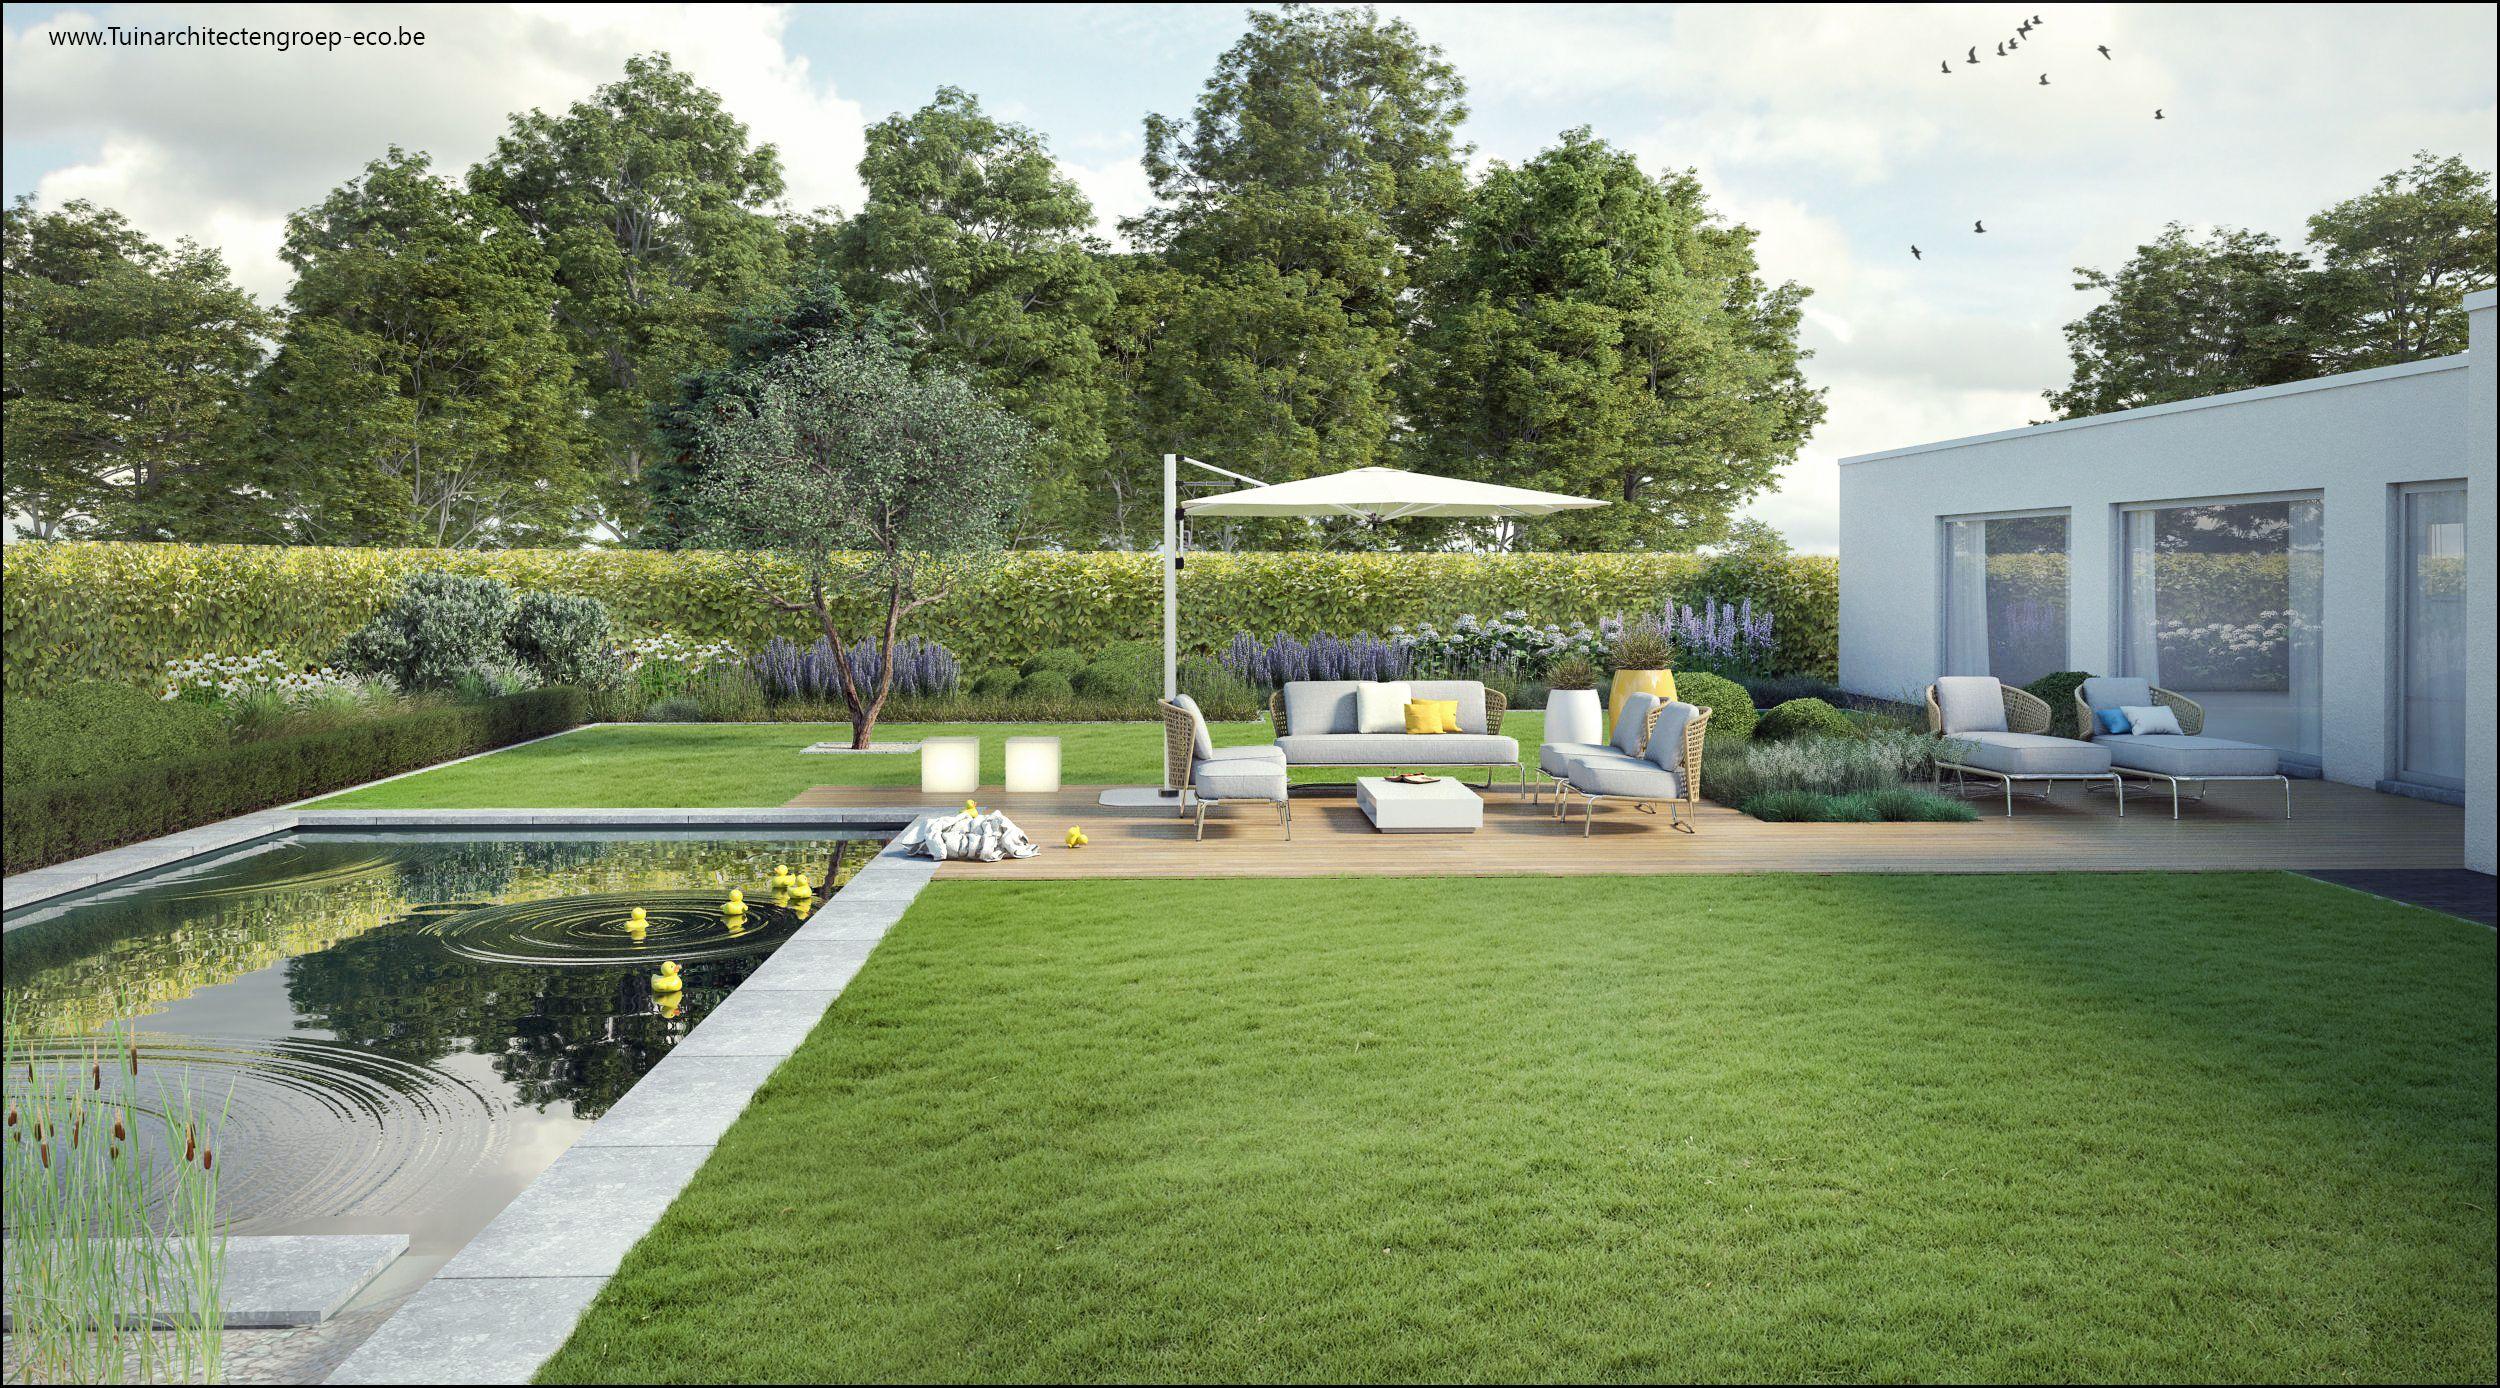 Moderne tuin met houten terras vlonder zwemvijver for 3d tuinarchitect